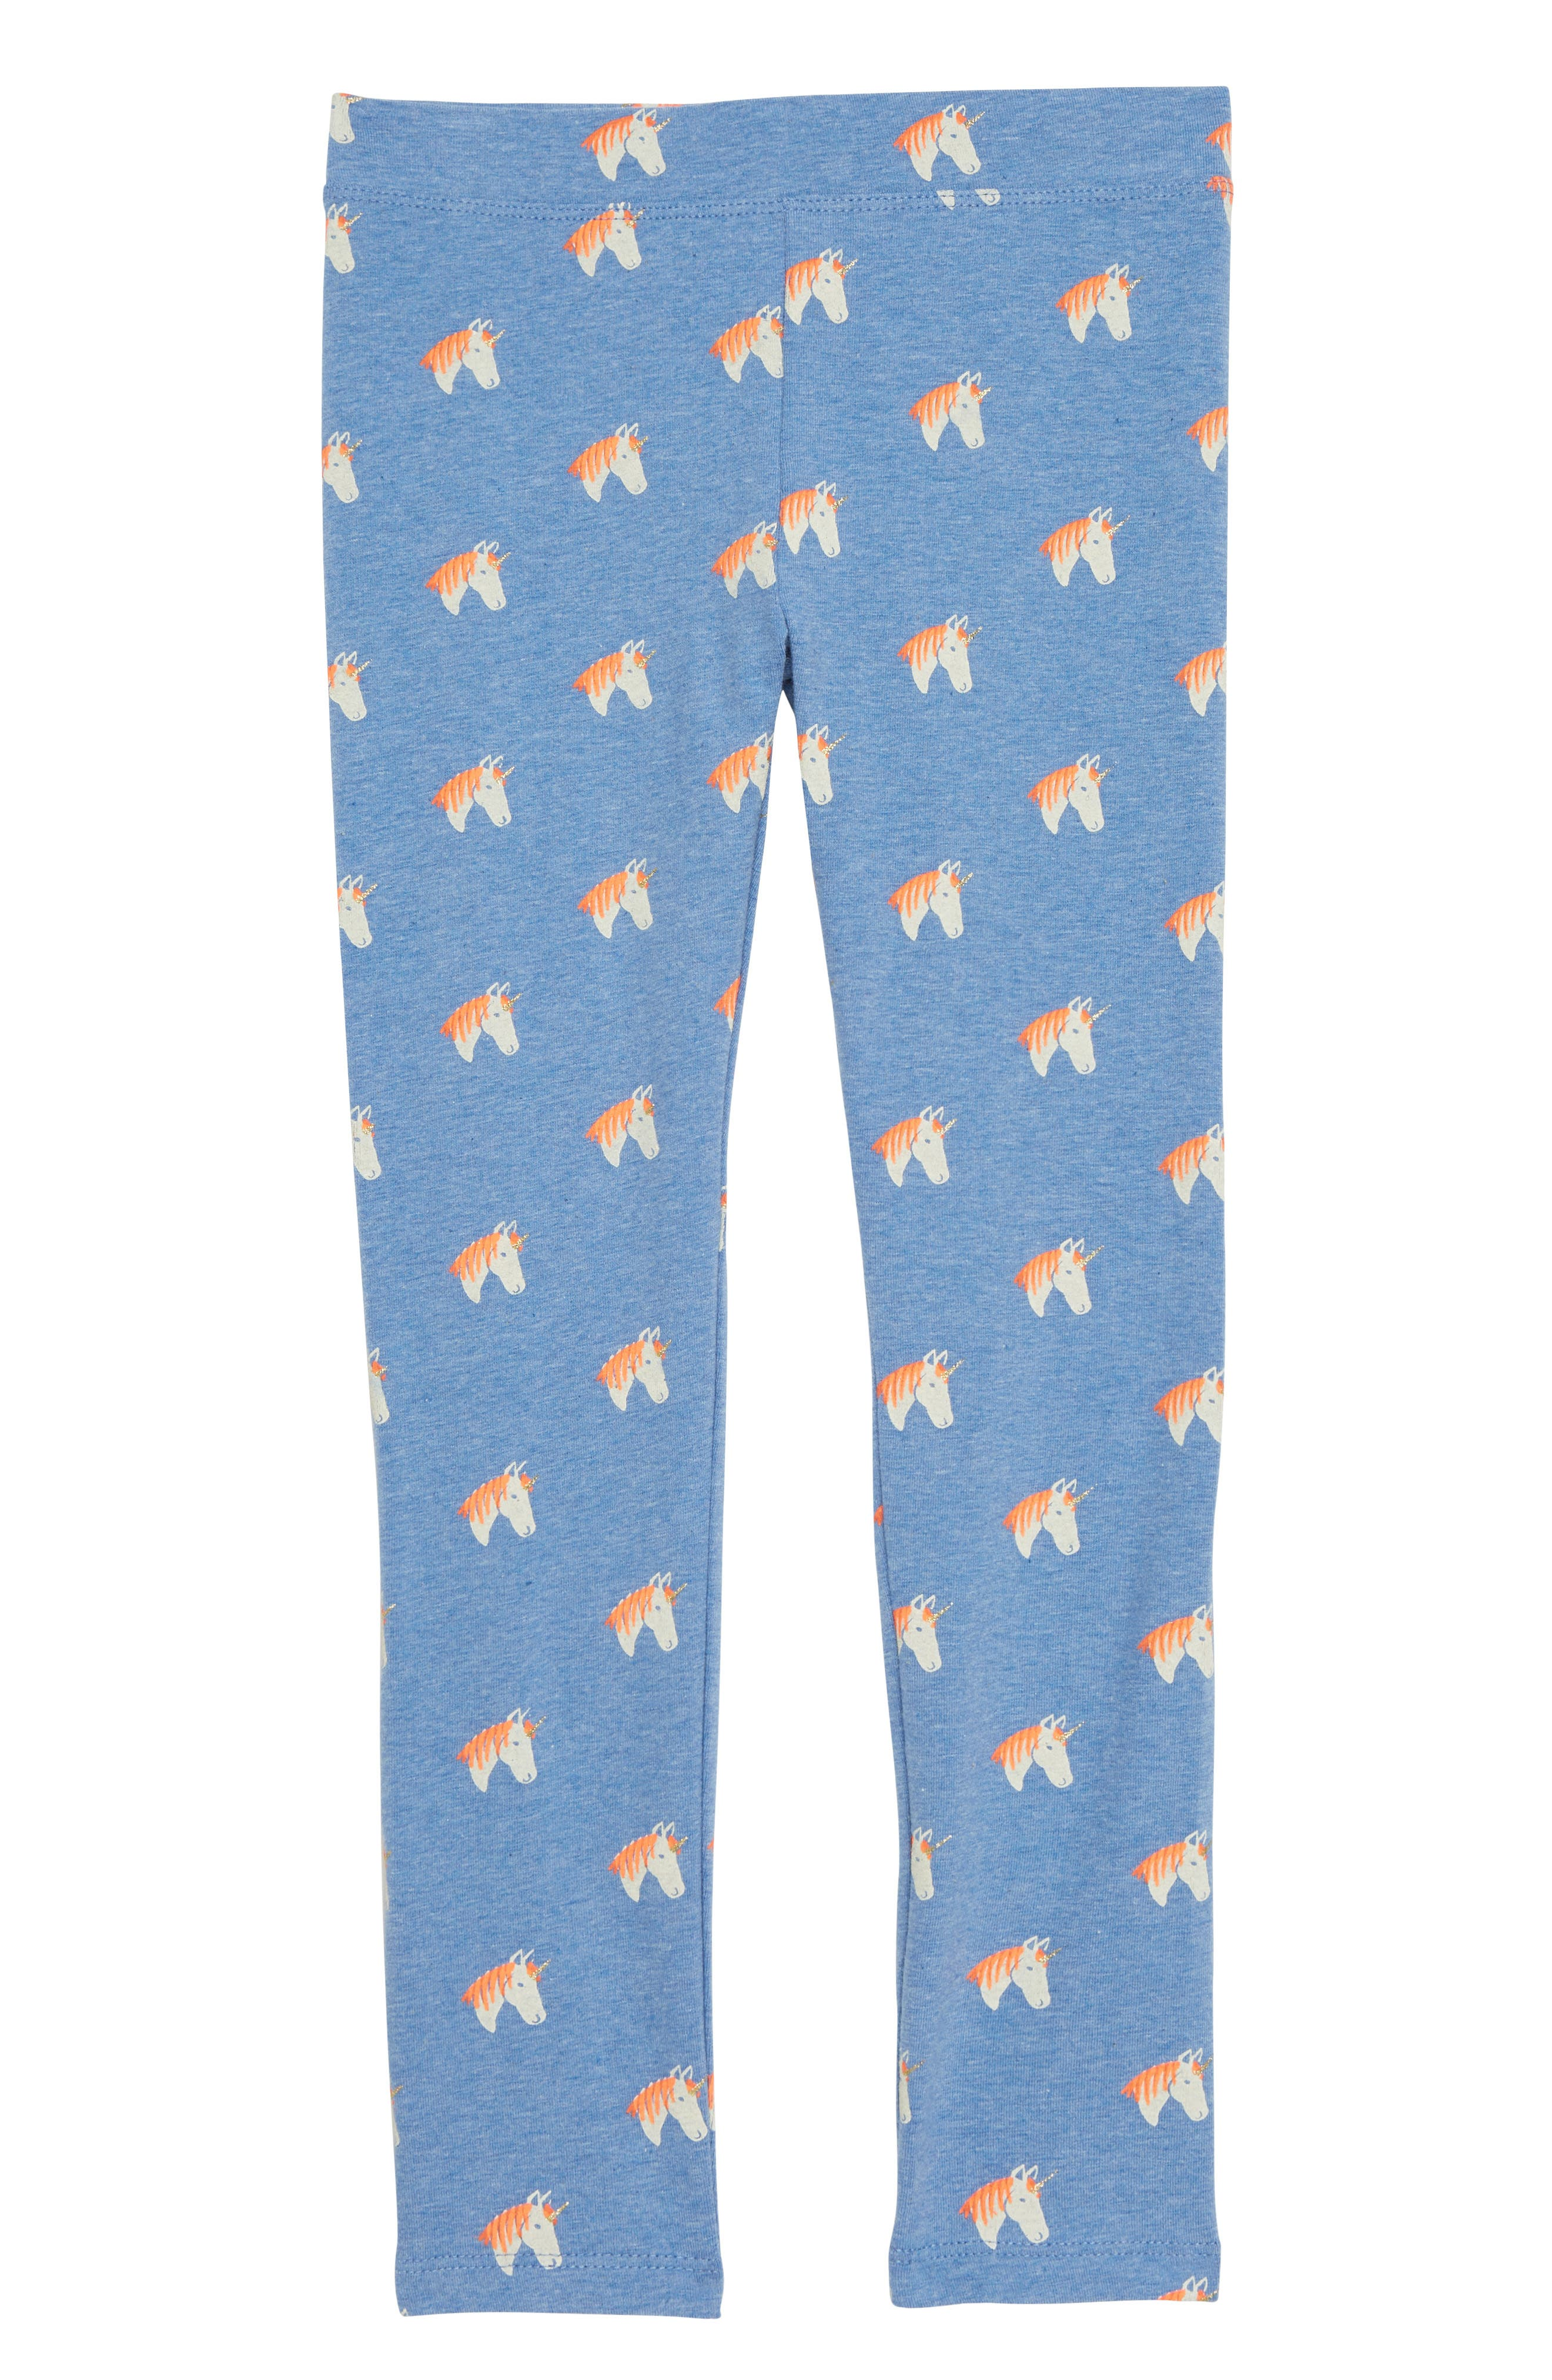 Unicorn Leggings,                             Main thumbnail 1, color,                             400